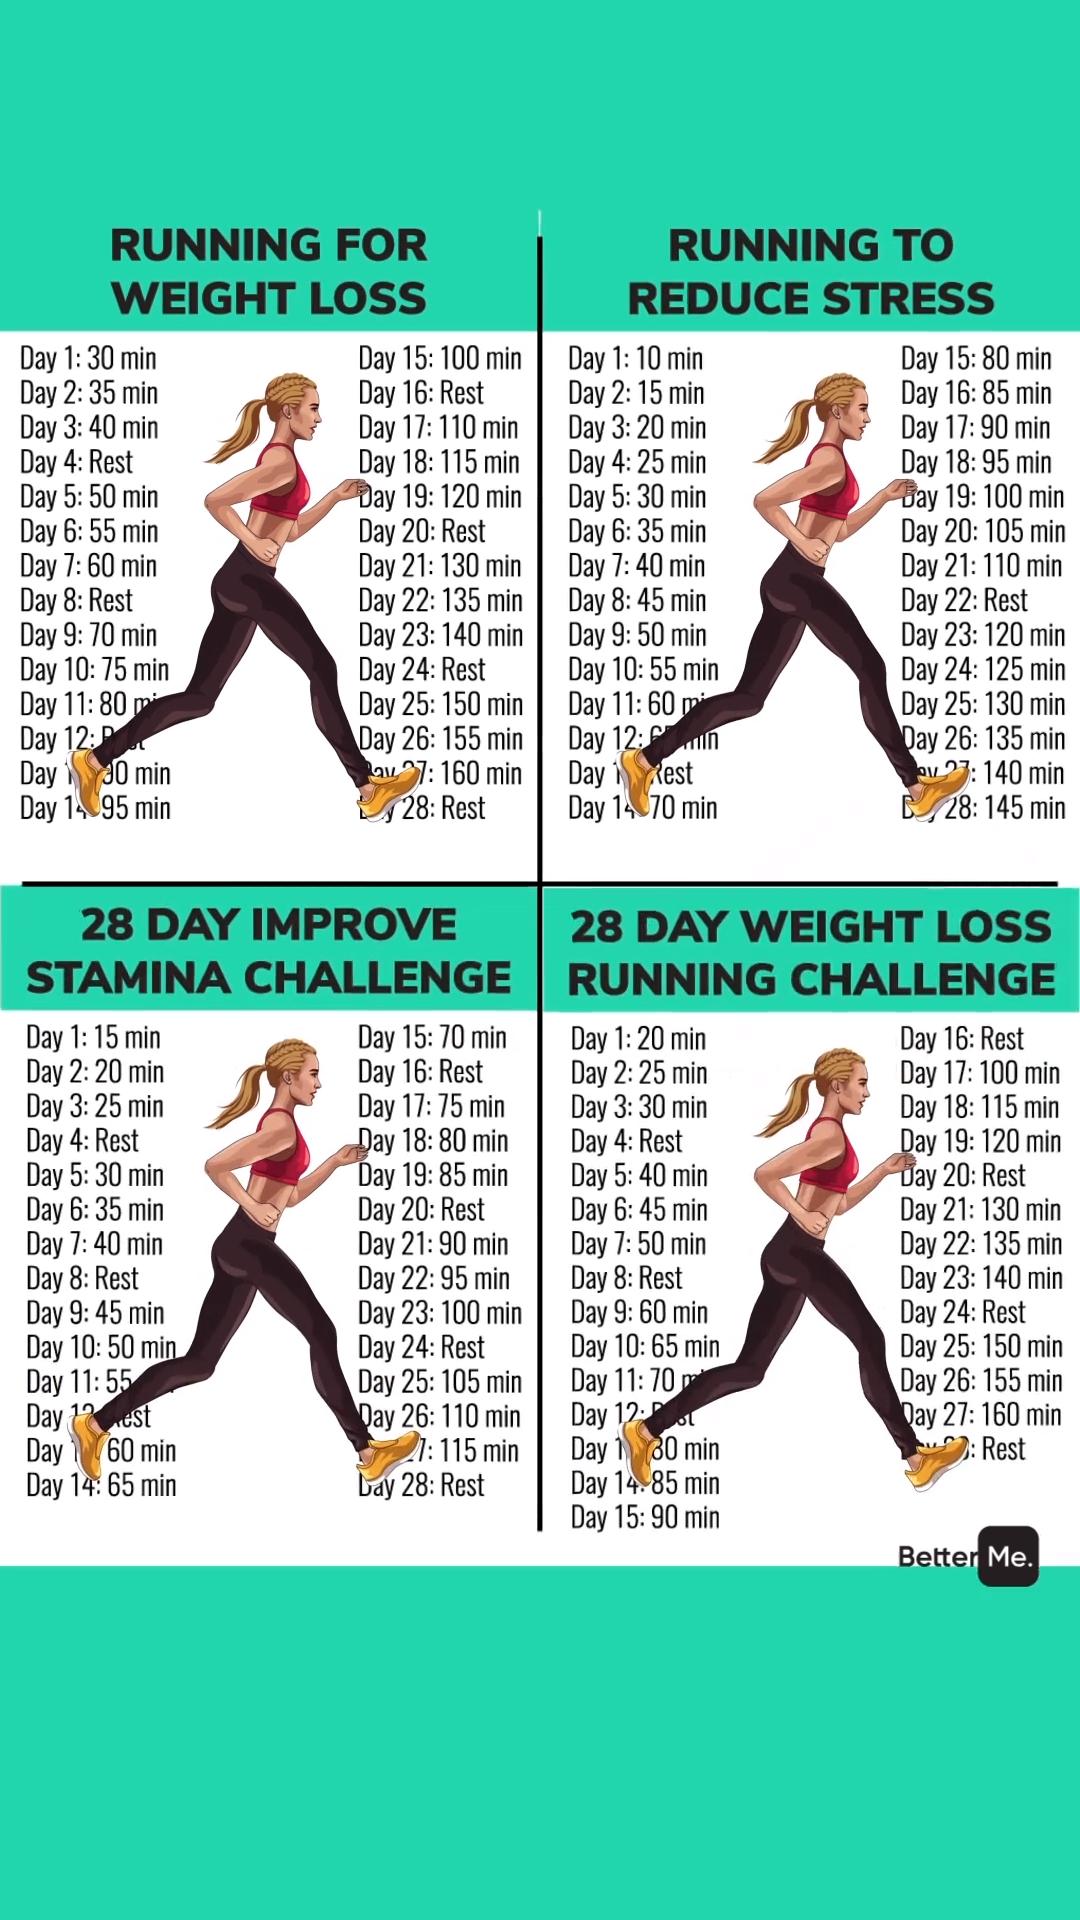 28 Day Running Plan To Lose Weight!